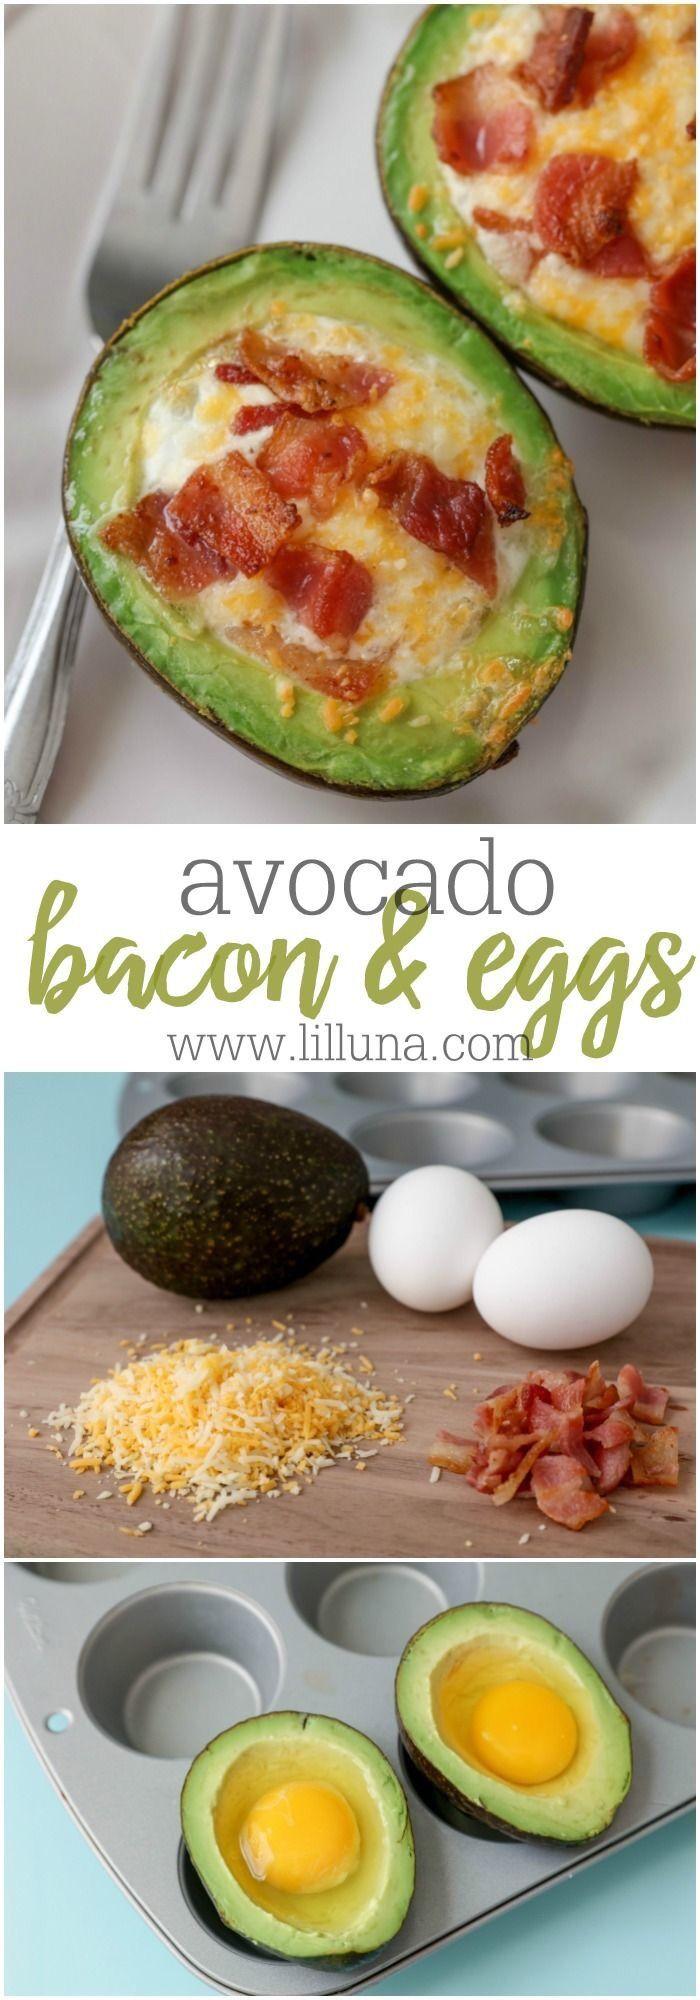 27 ways to enjoy eating Avocado: food recipes